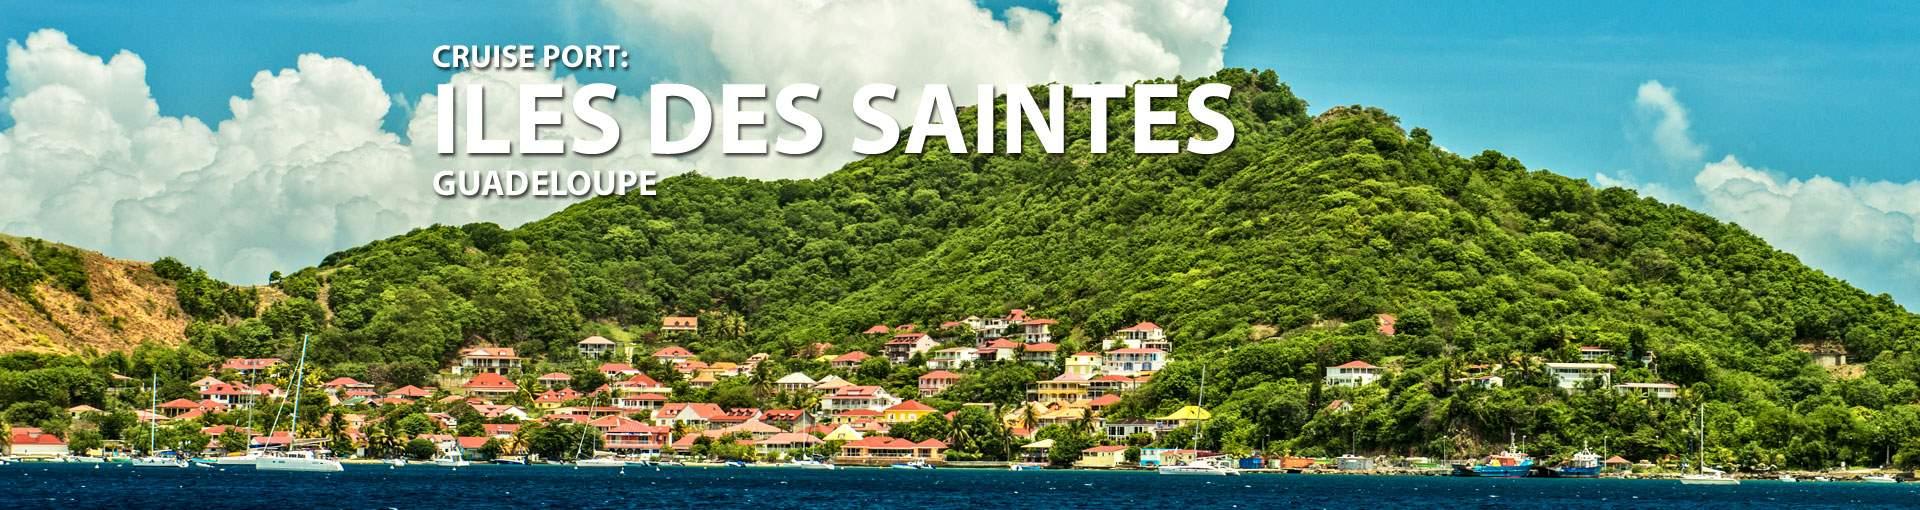 Cruises to Iles Des Saintes, Guadeloupe